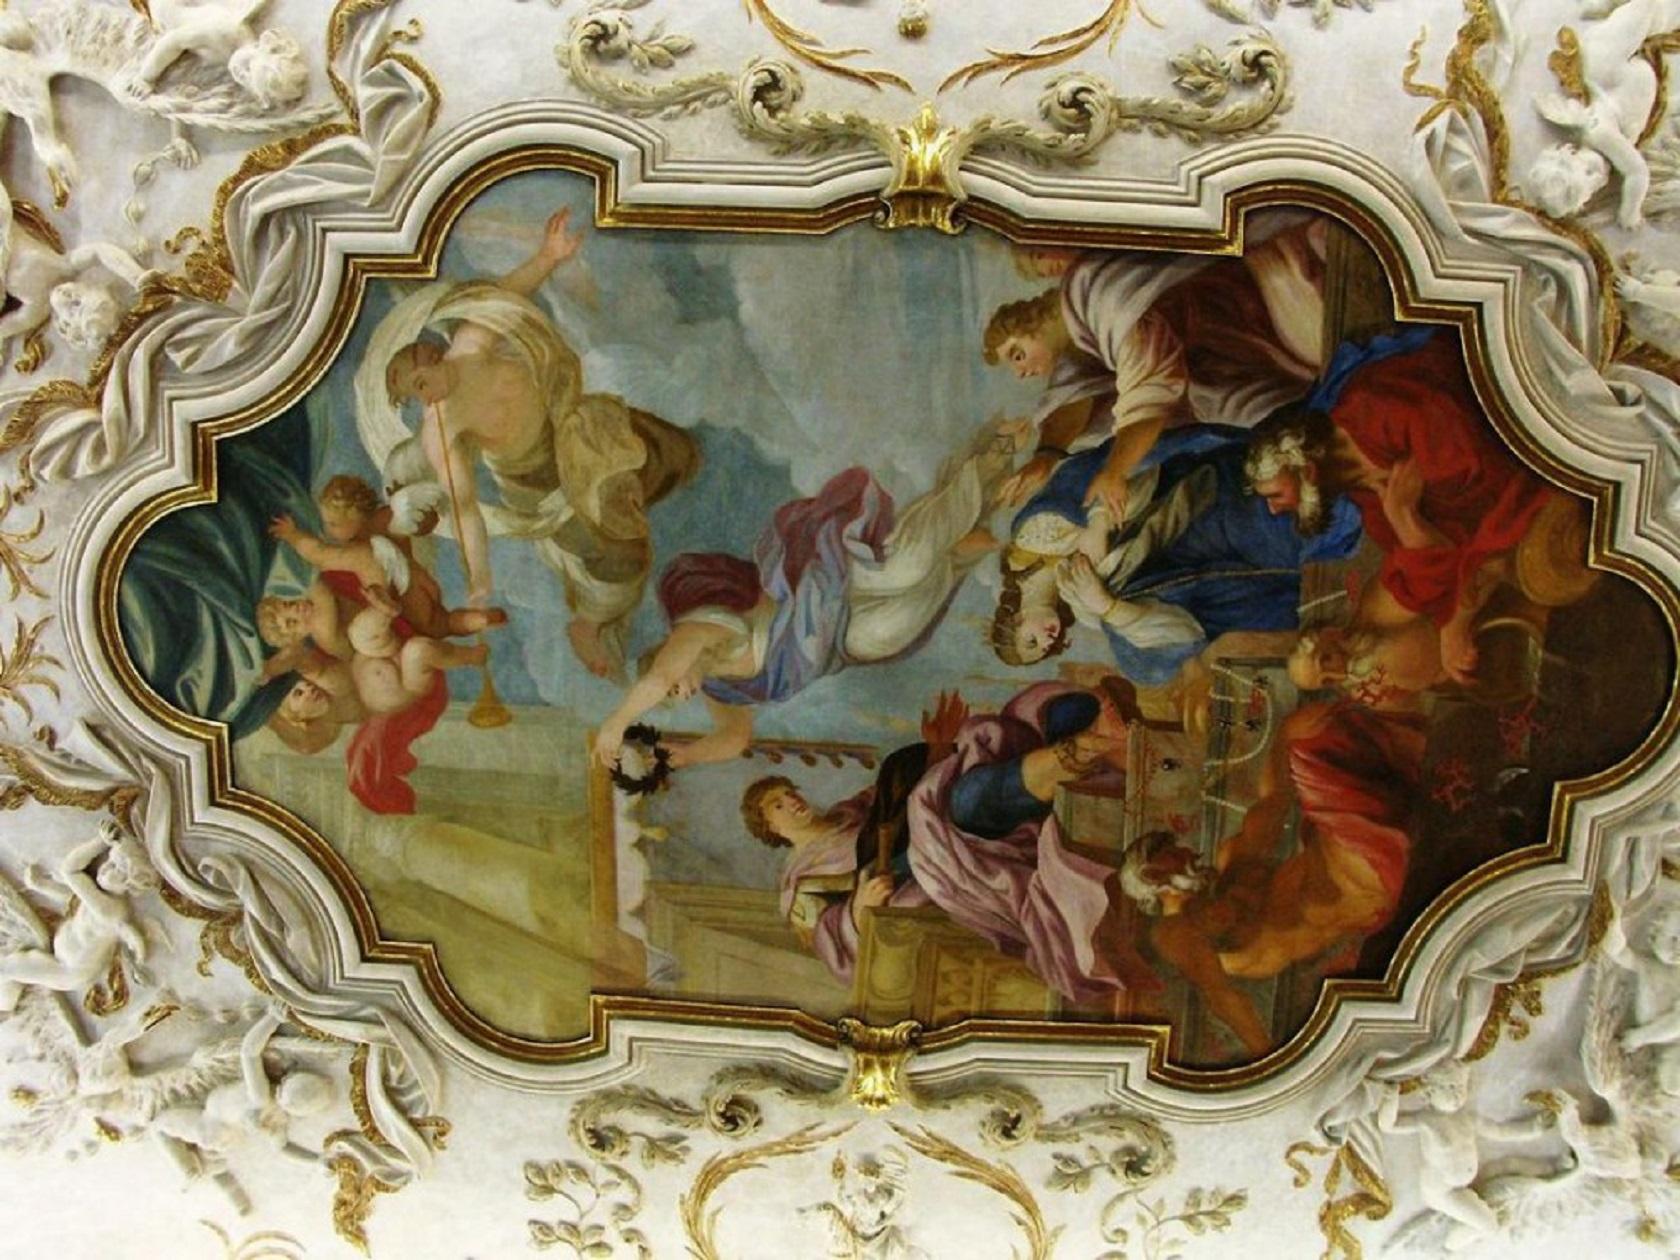 Потолочная фреска Штернбергского дворца